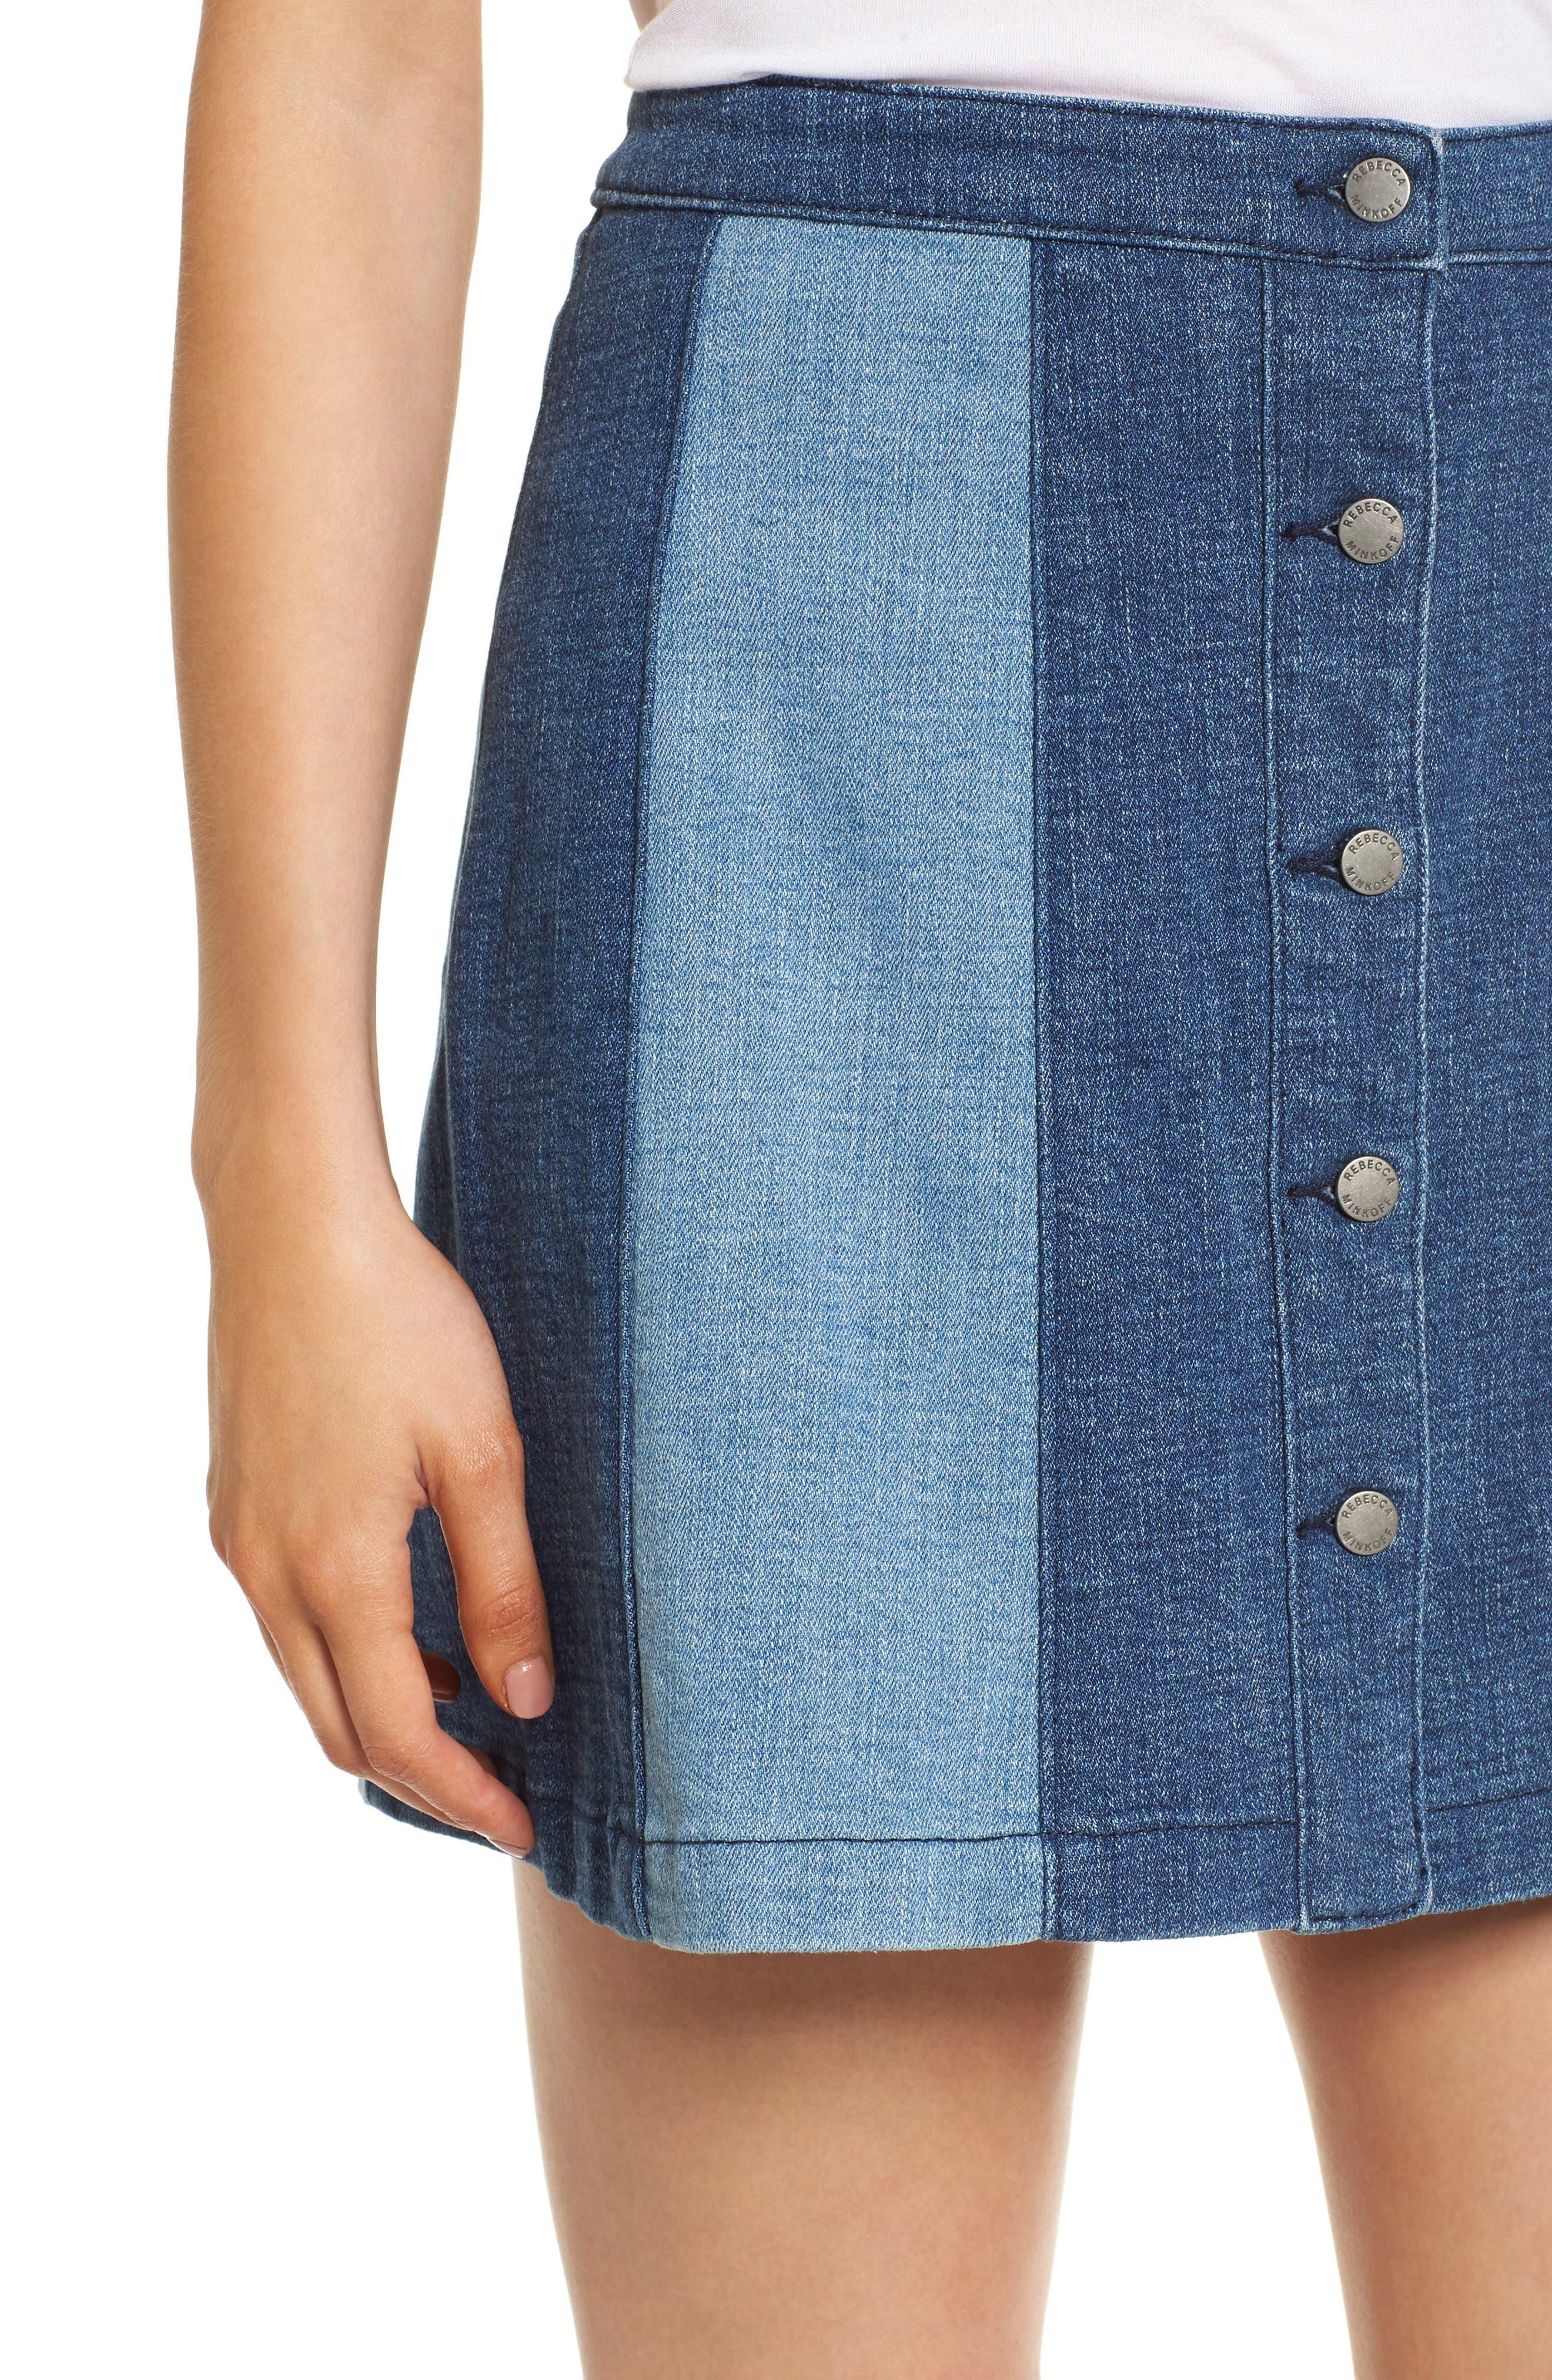 Beatty Denim Miniskirt,                             Alternate thumbnail 4, color,                             Indigo